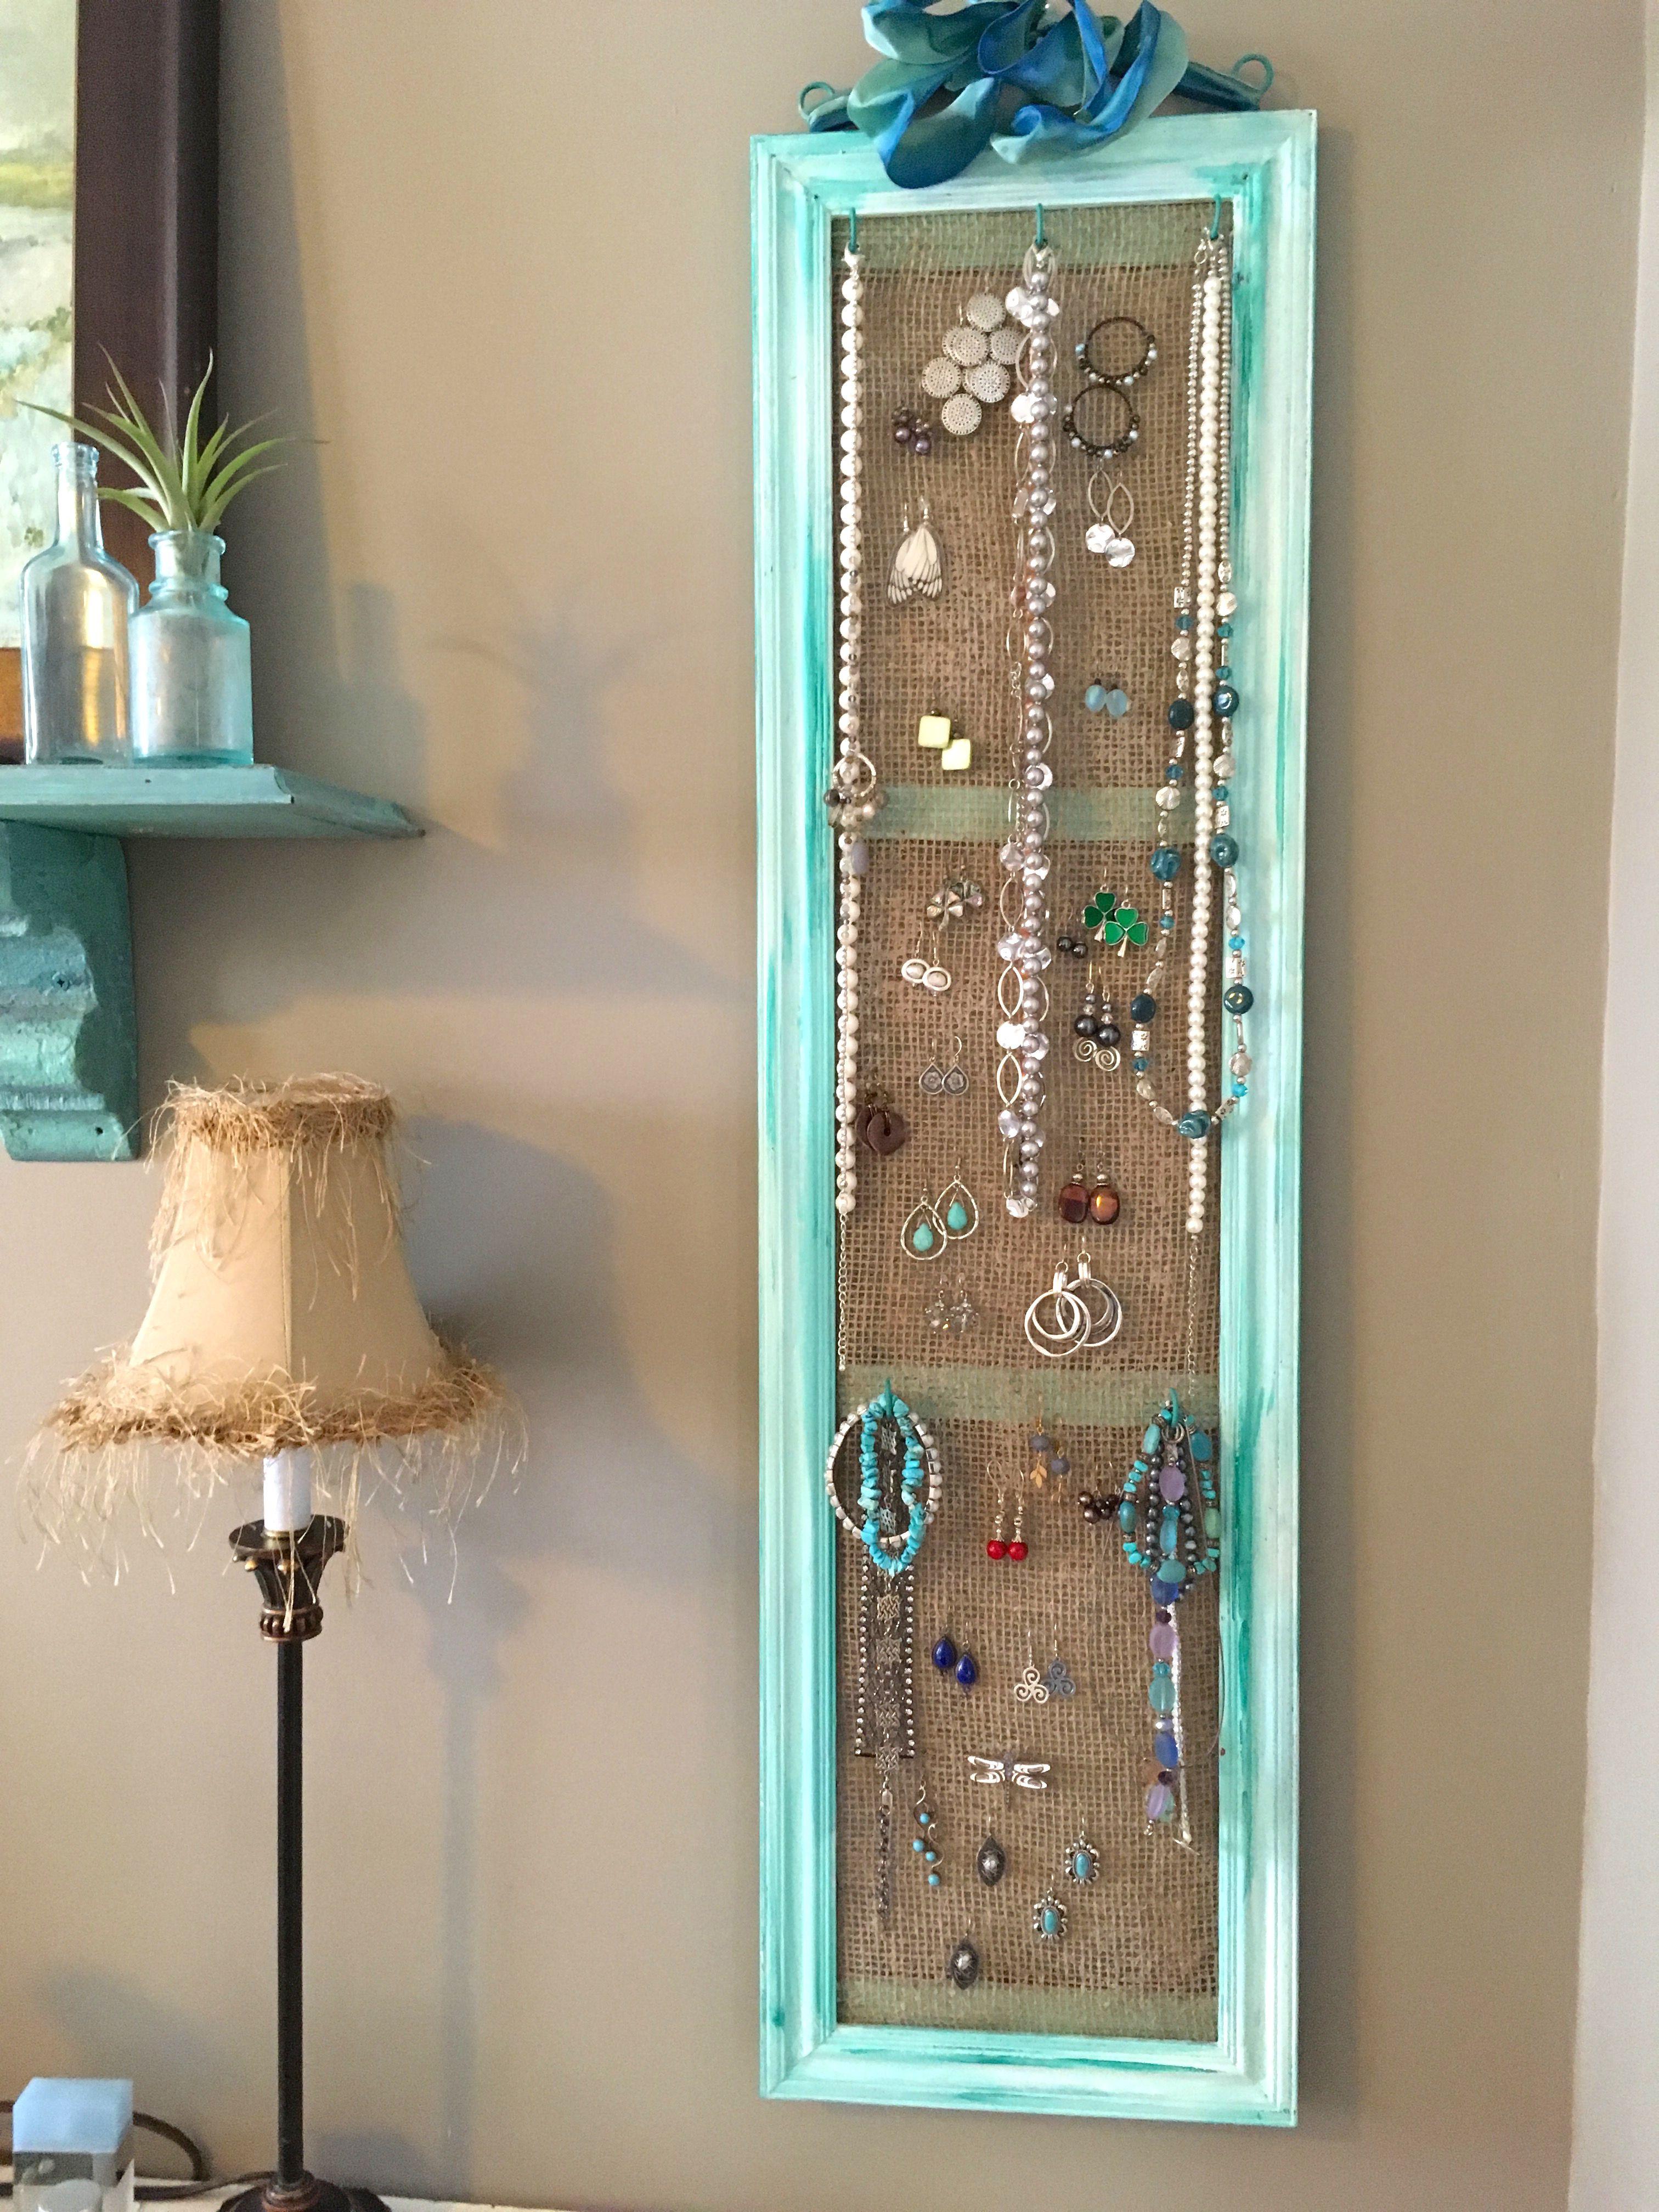 Diy Jewelry Organizer The Home Depot Community Jewelry